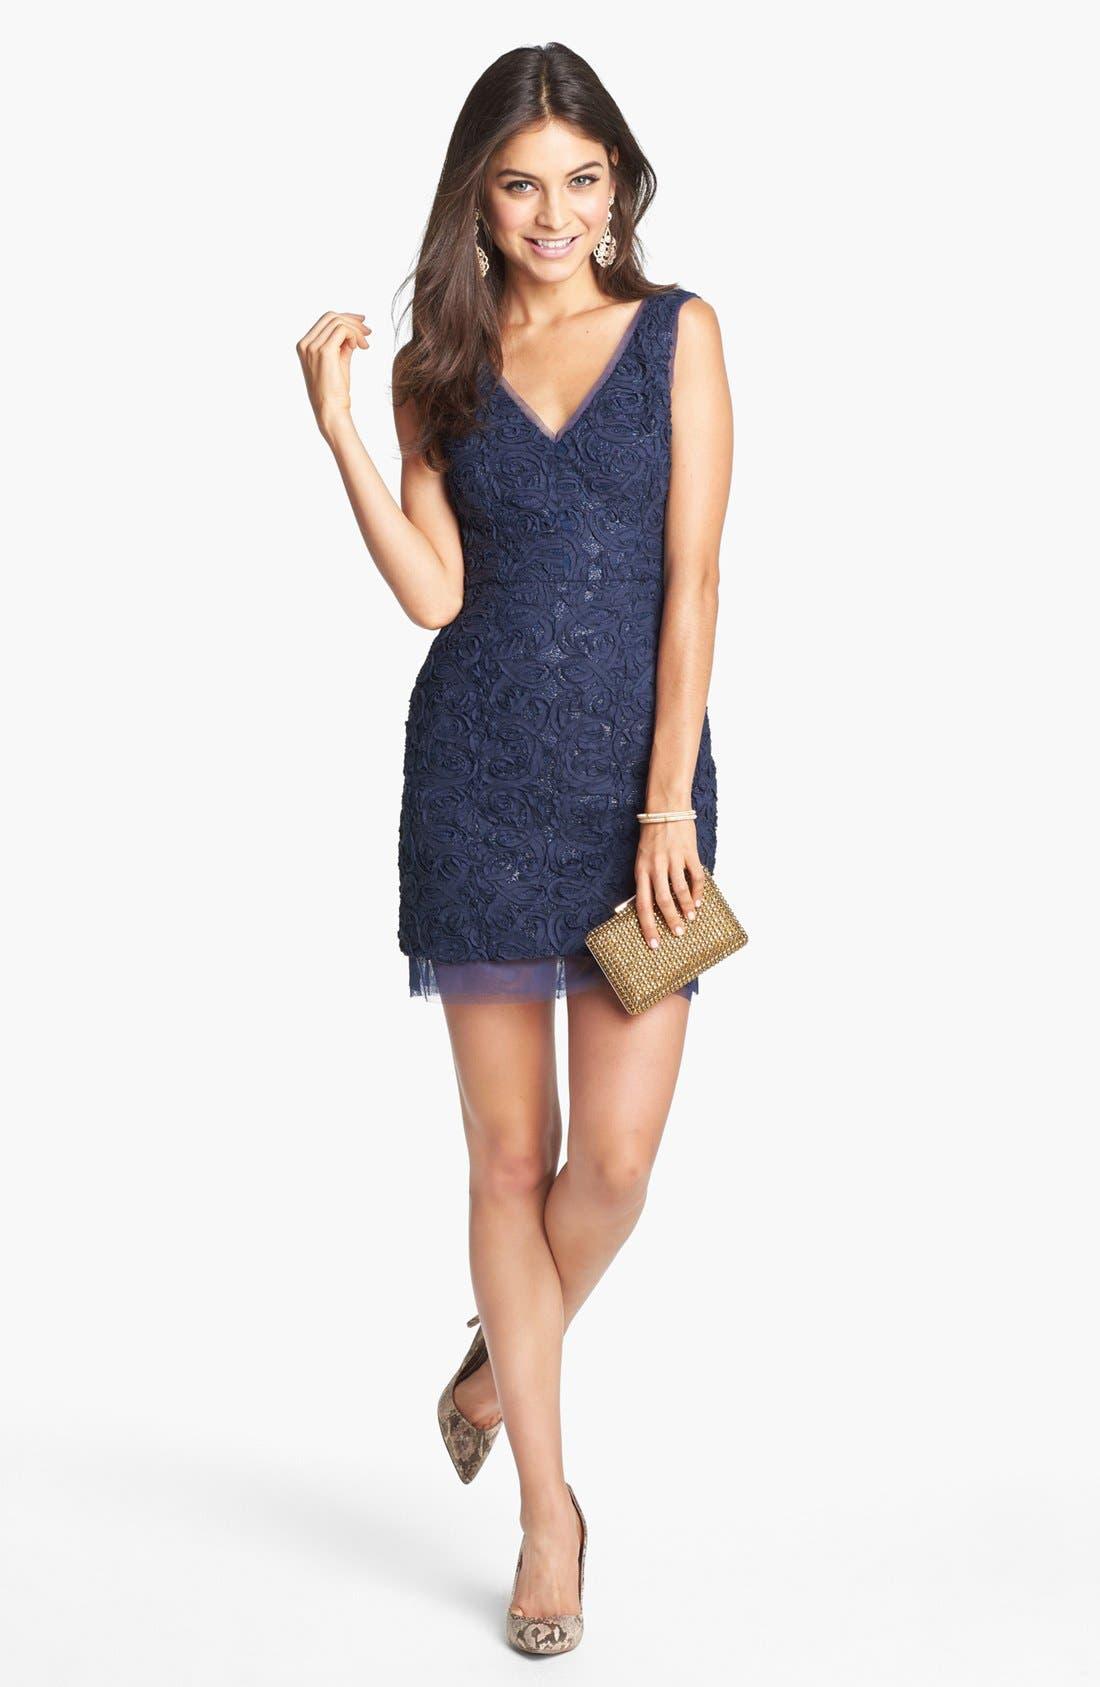 Alternate Image 1 Selected - BCBGMAXAZRIA 'Marissa' Rosette Embellished Sheath Dress